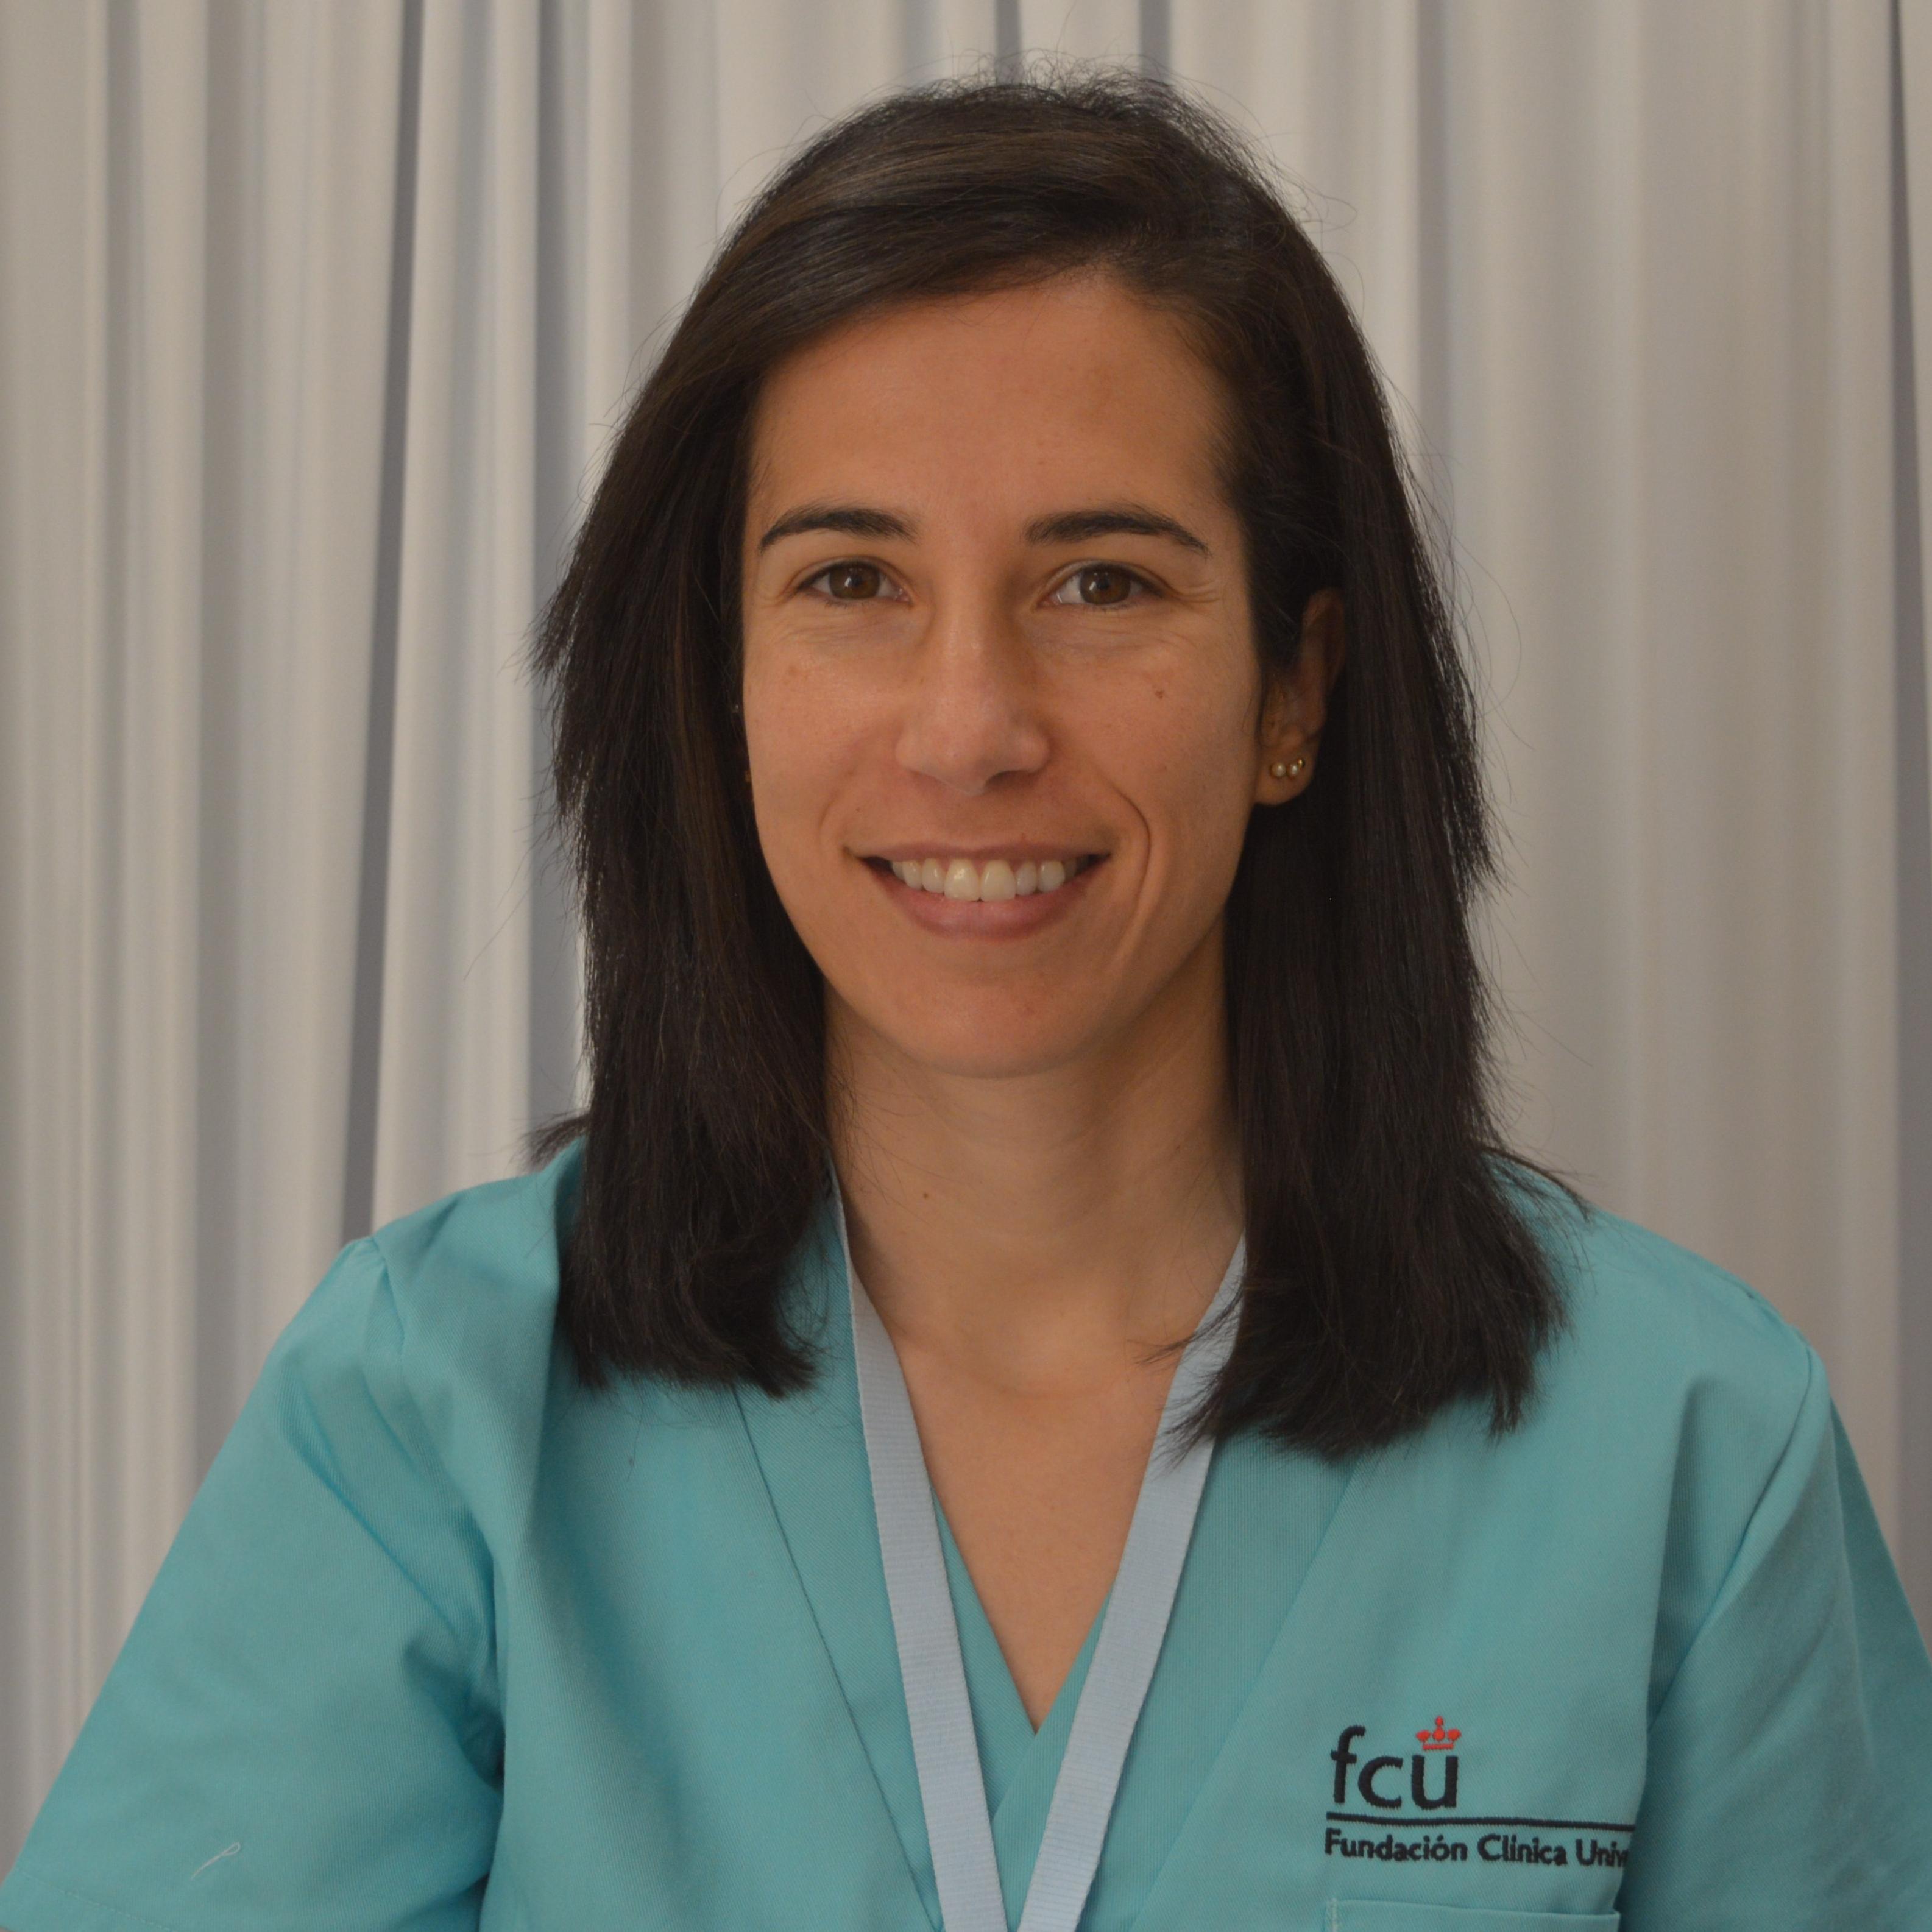 Margarita Vázquez Gómez